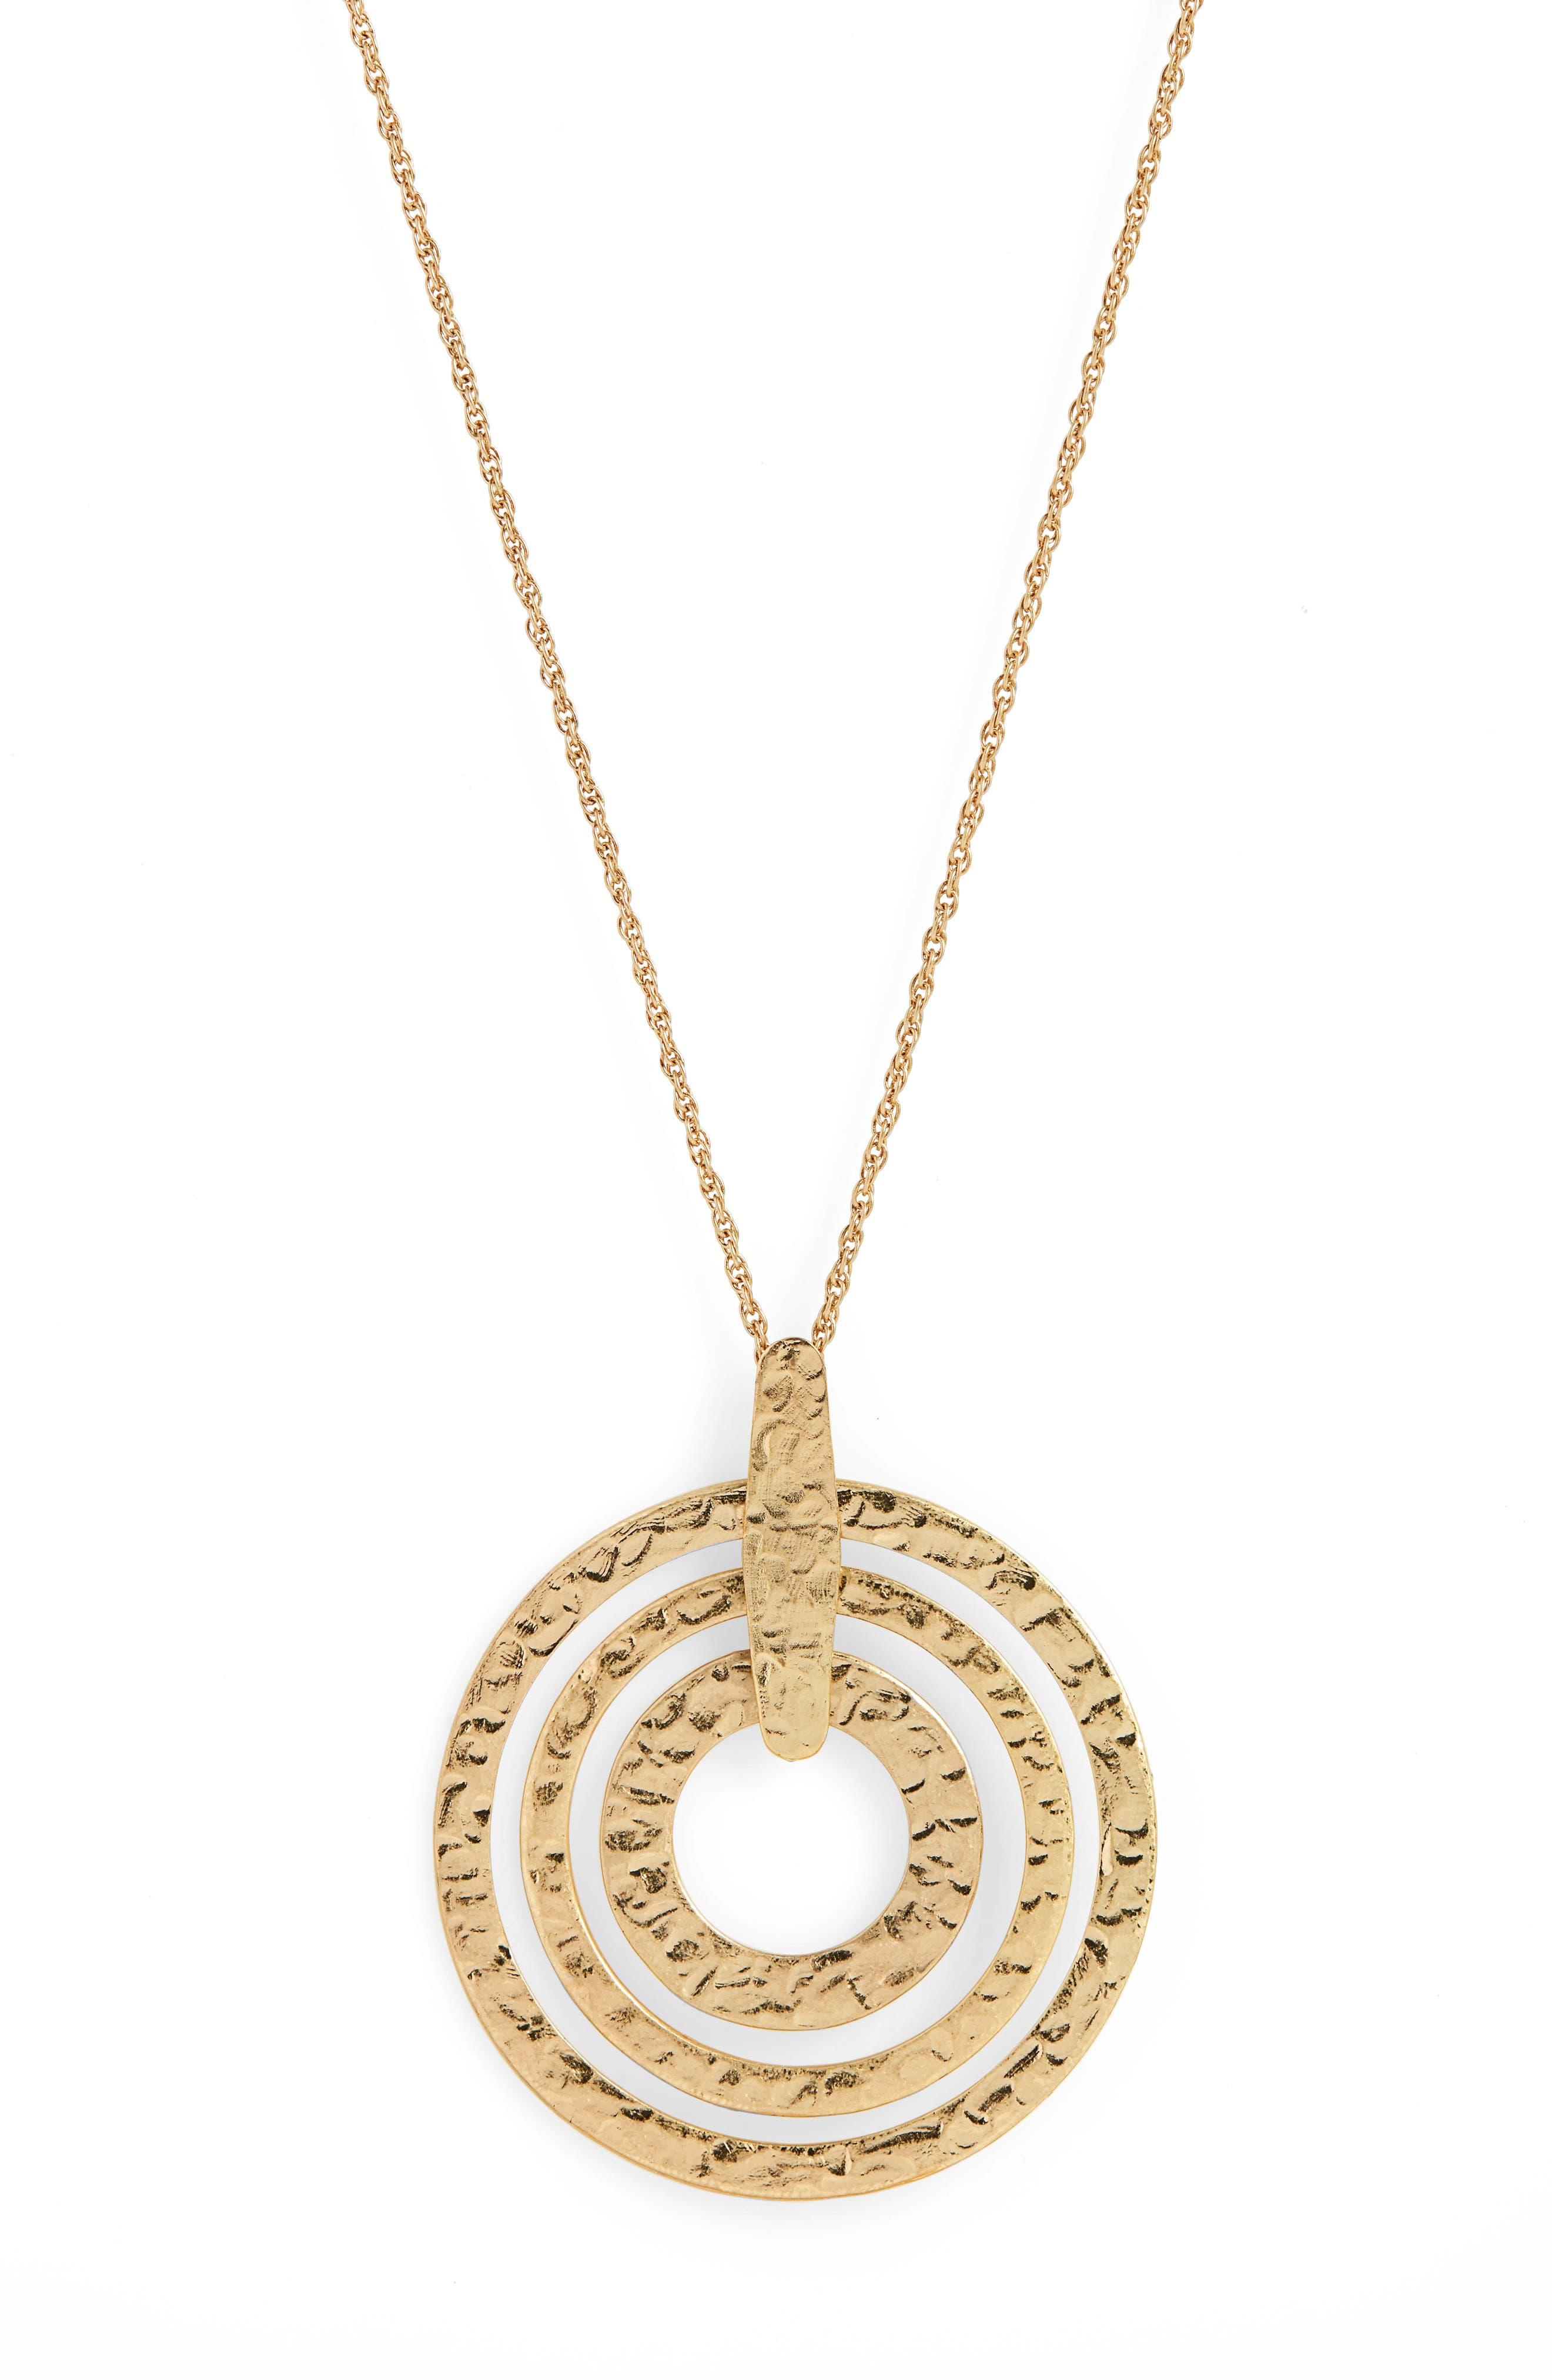 Circle Pendant Necklace,                             Alternate thumbnail 2, color,                             GOLD